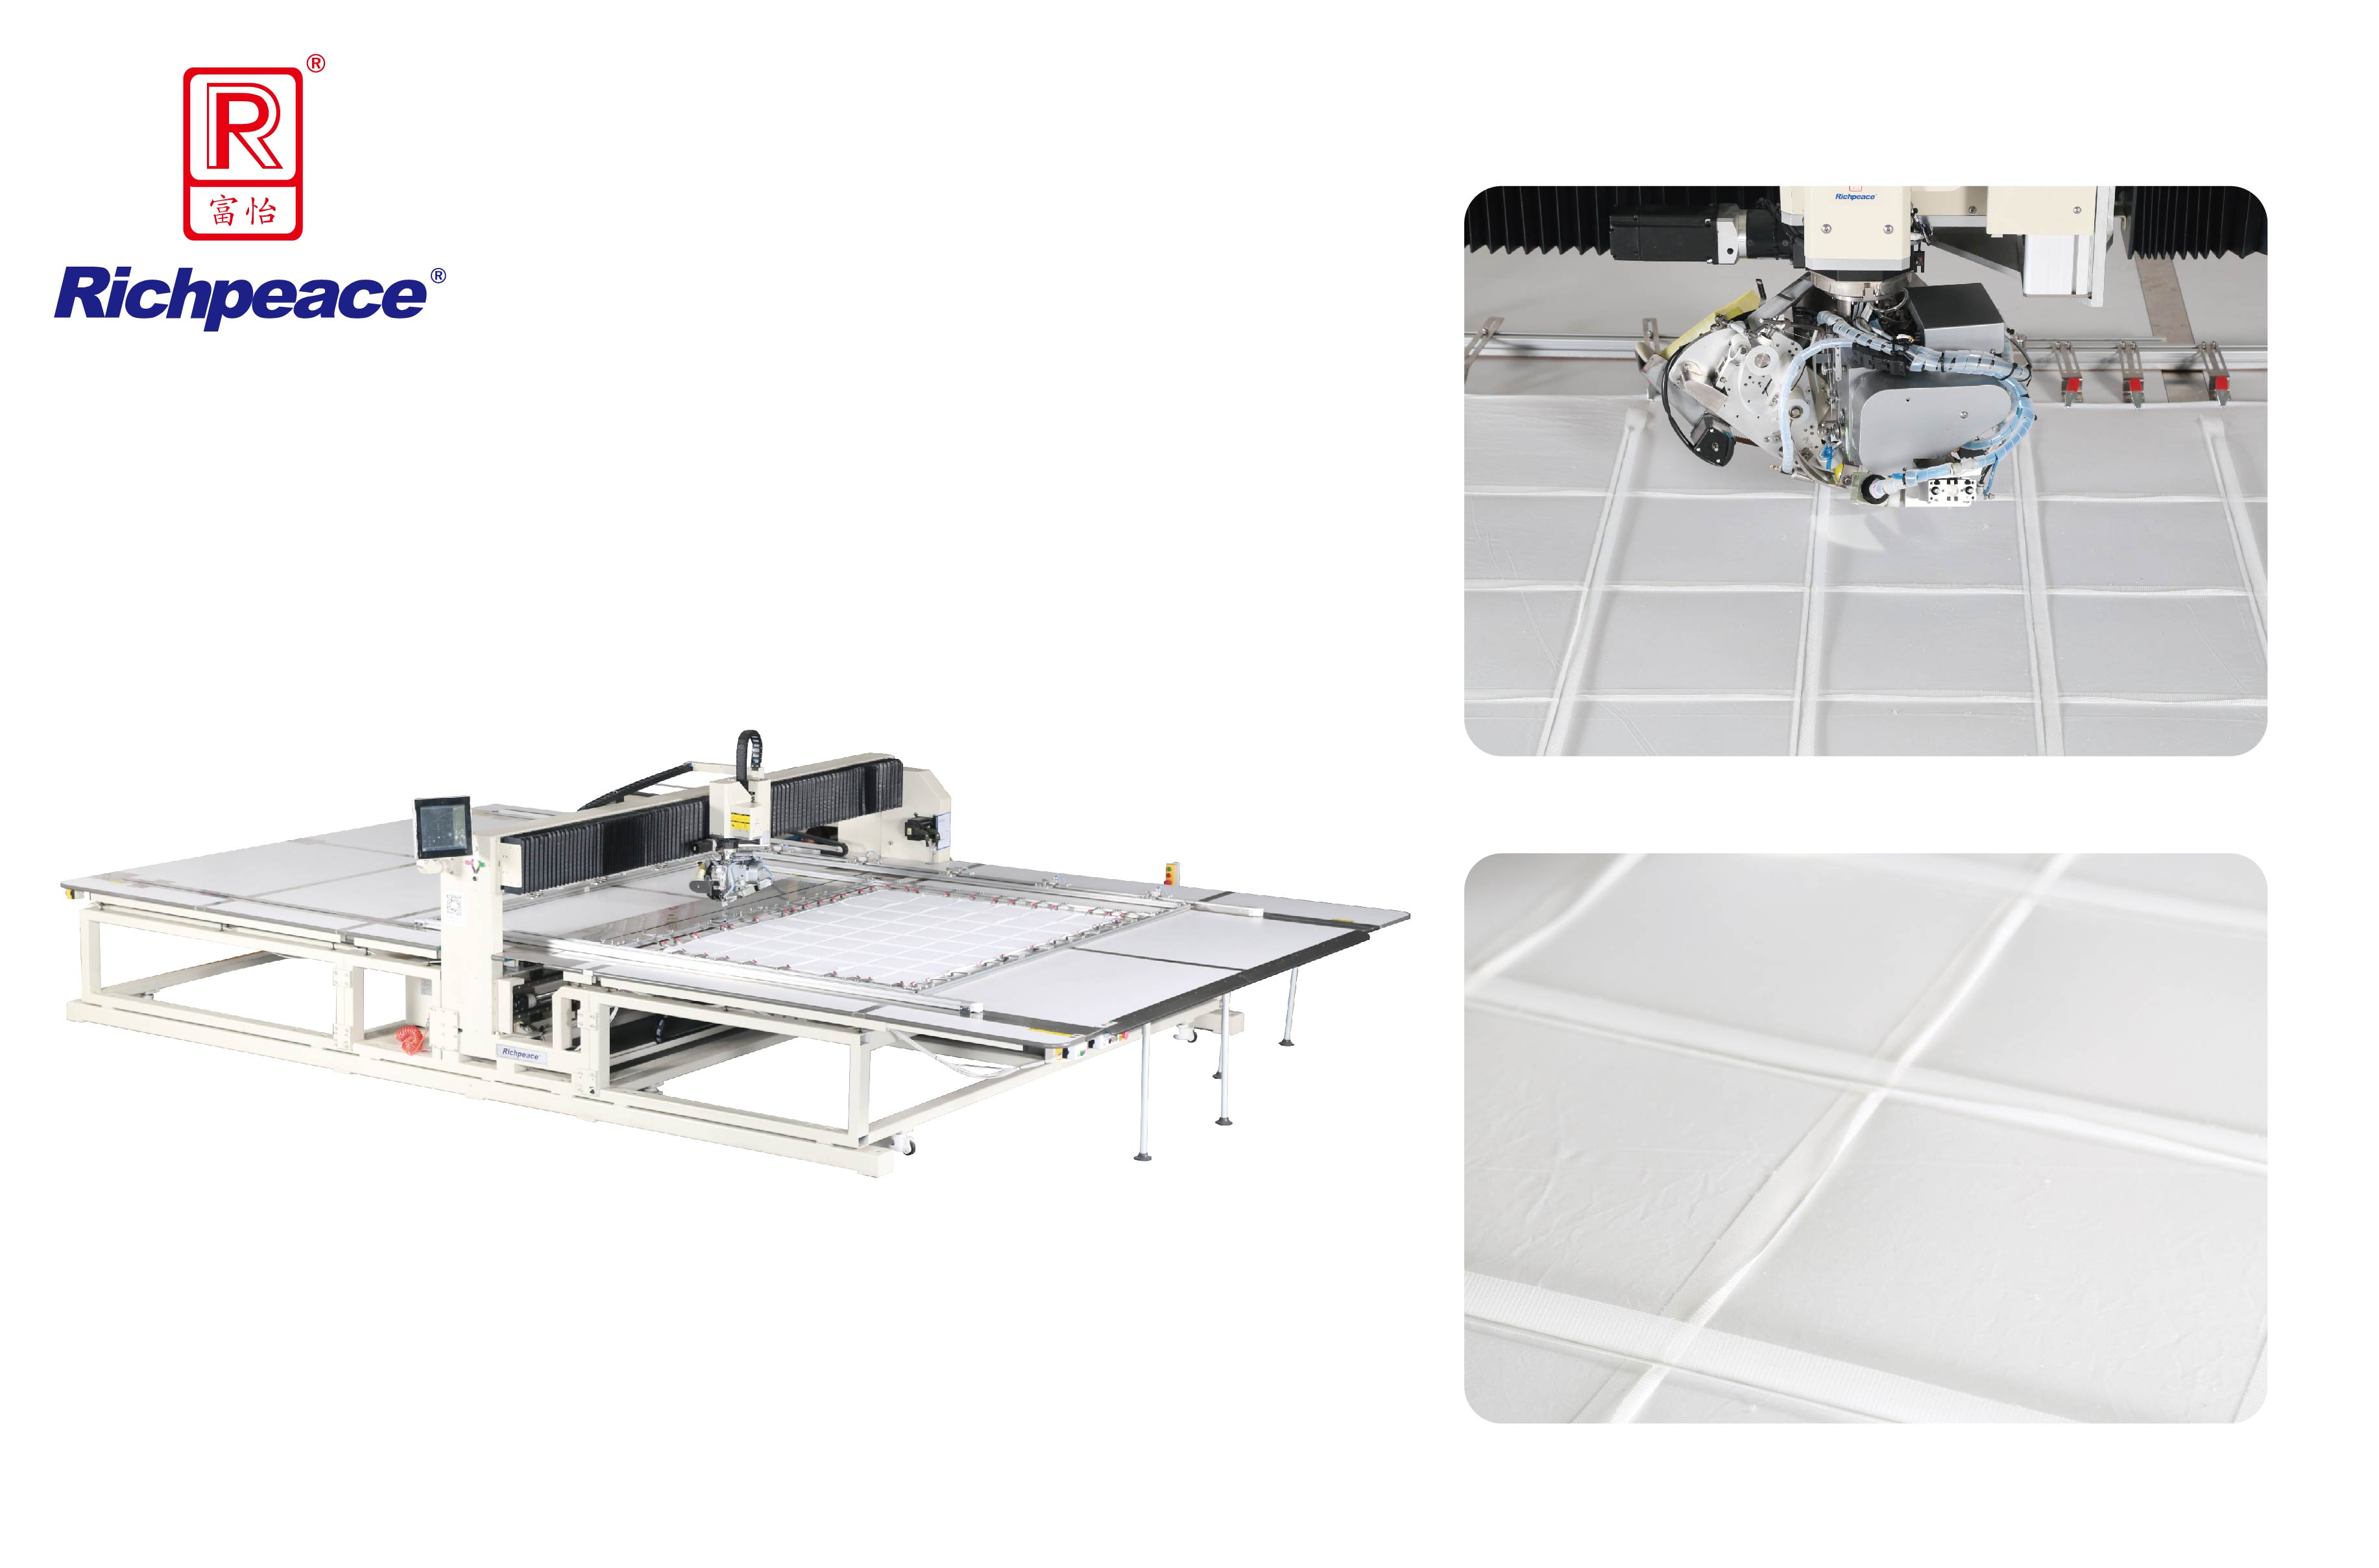 Richpeace Rotary Head Precision Quilting Machine-for Baffle Box Duvet